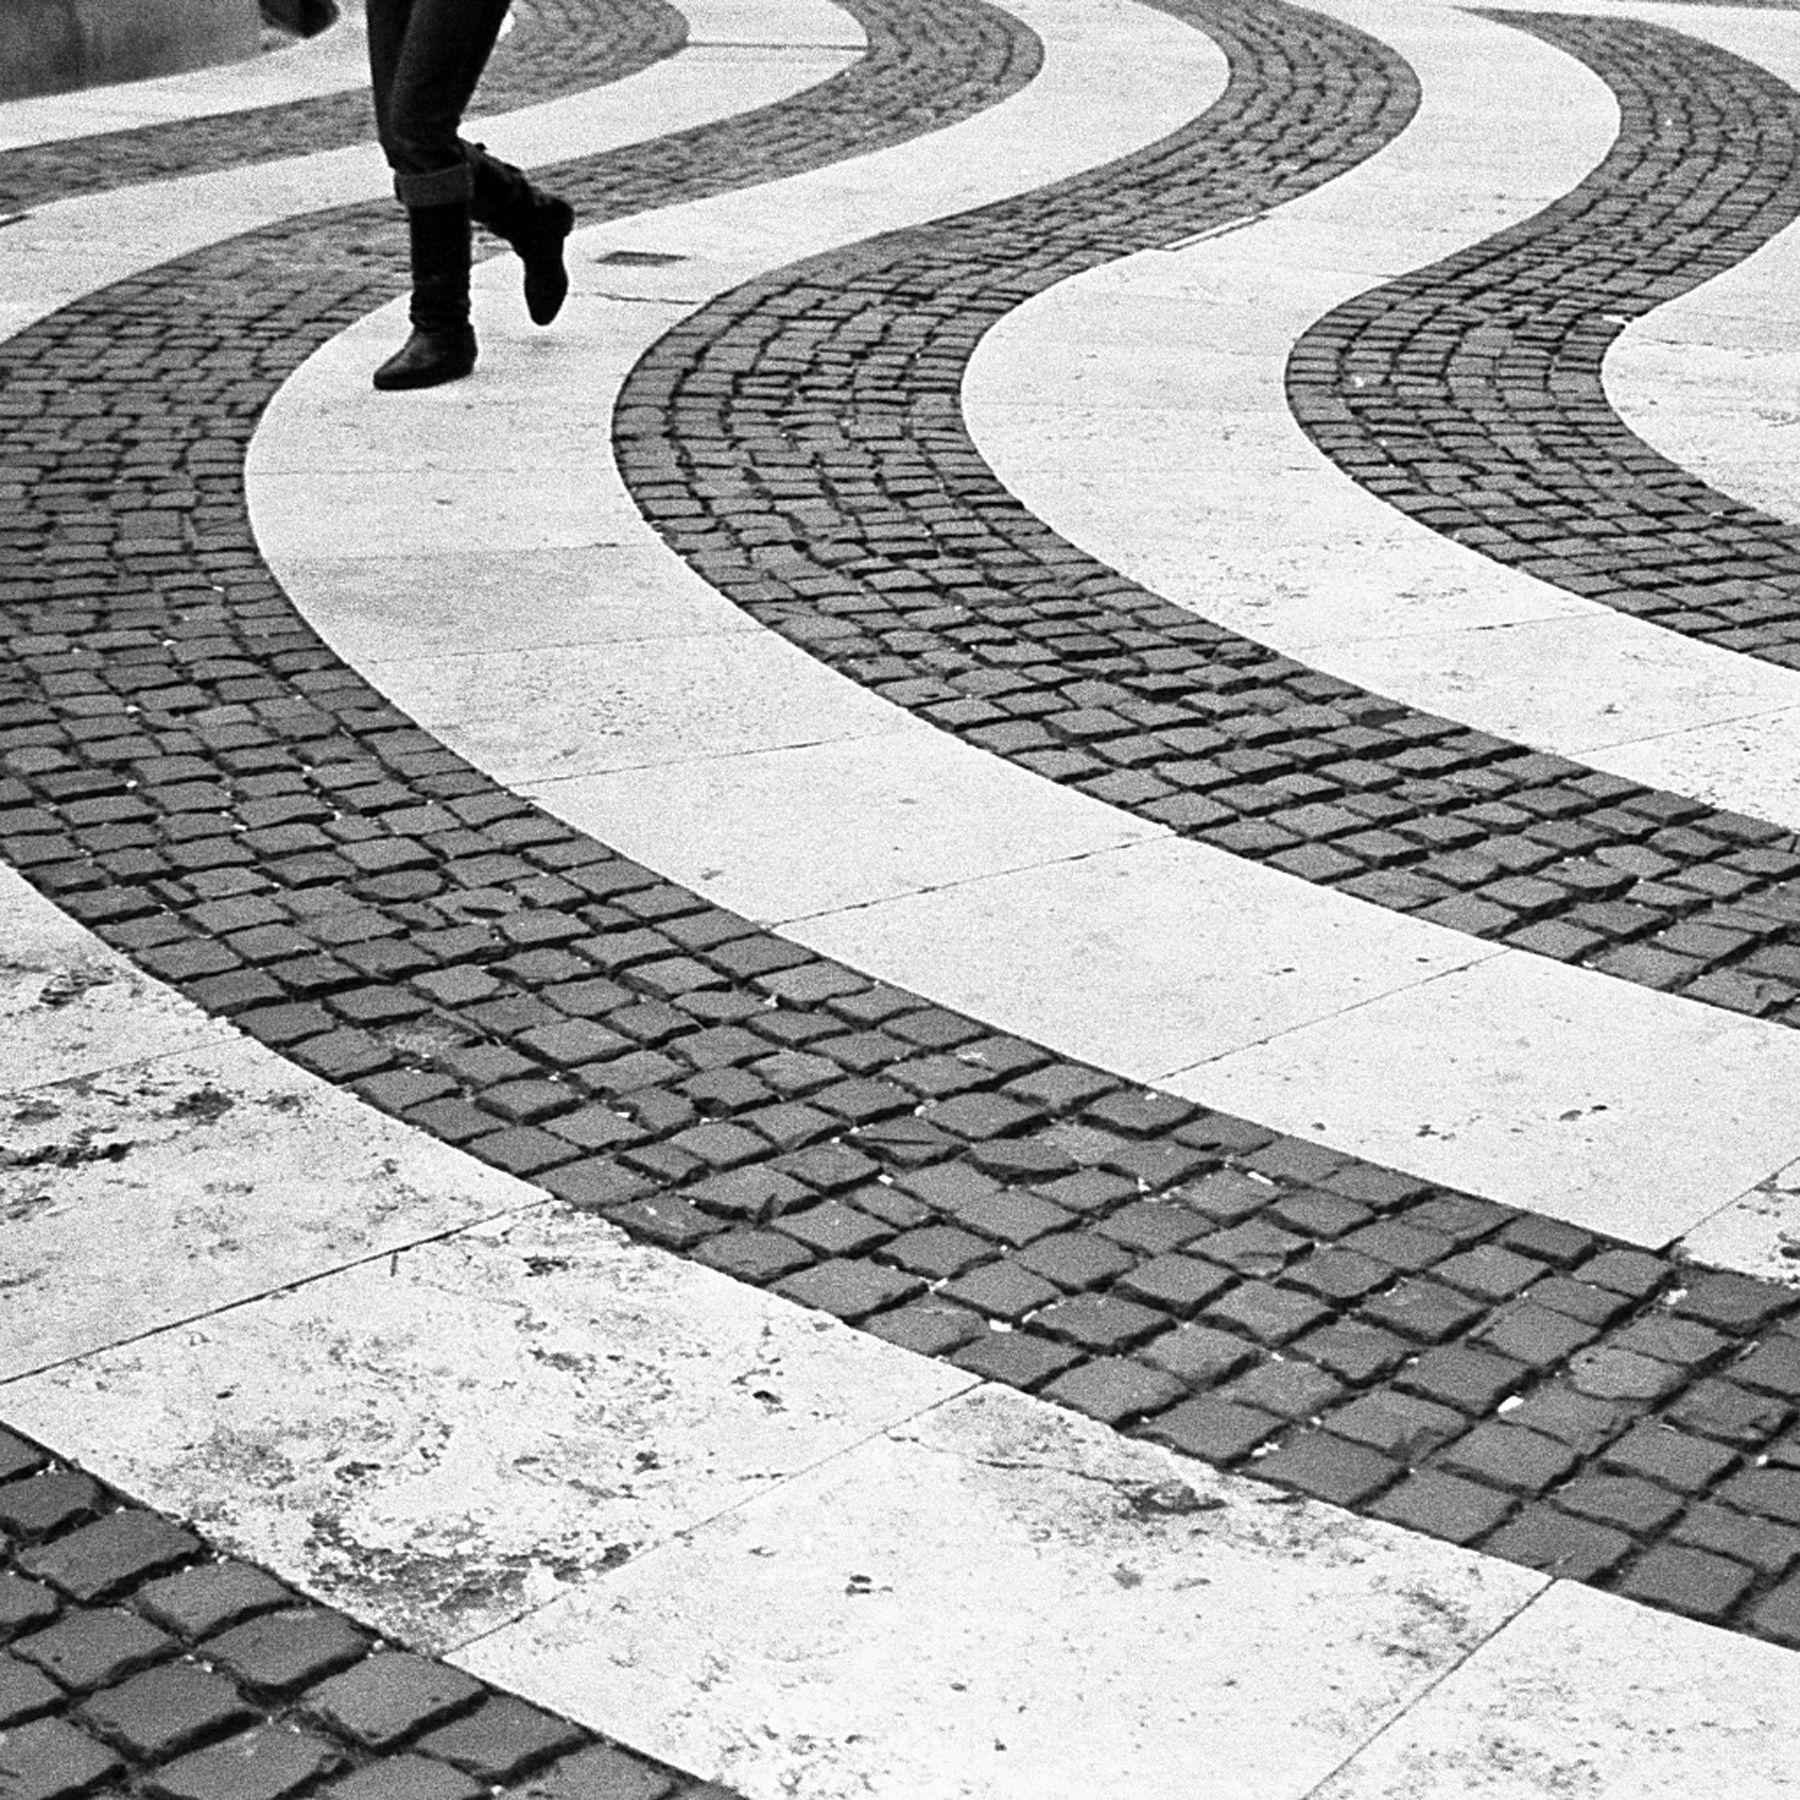 brick stripes pavement design